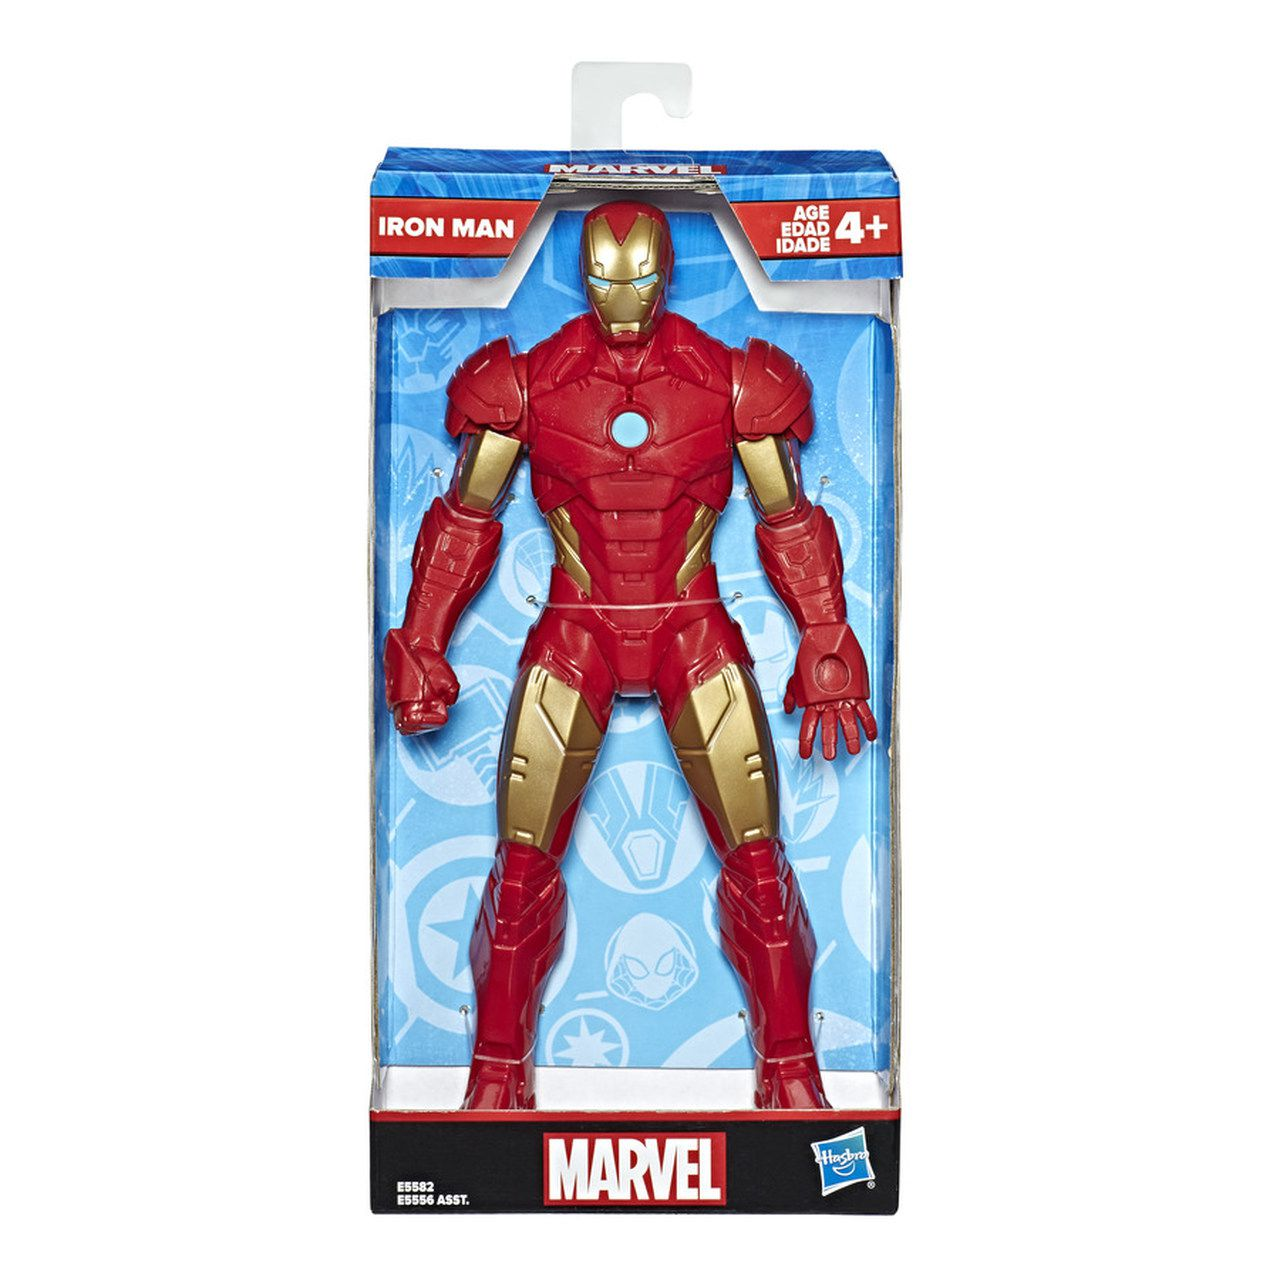 Boneco Homem de Ferro - Marvel - 25 cm - Original Hasbro